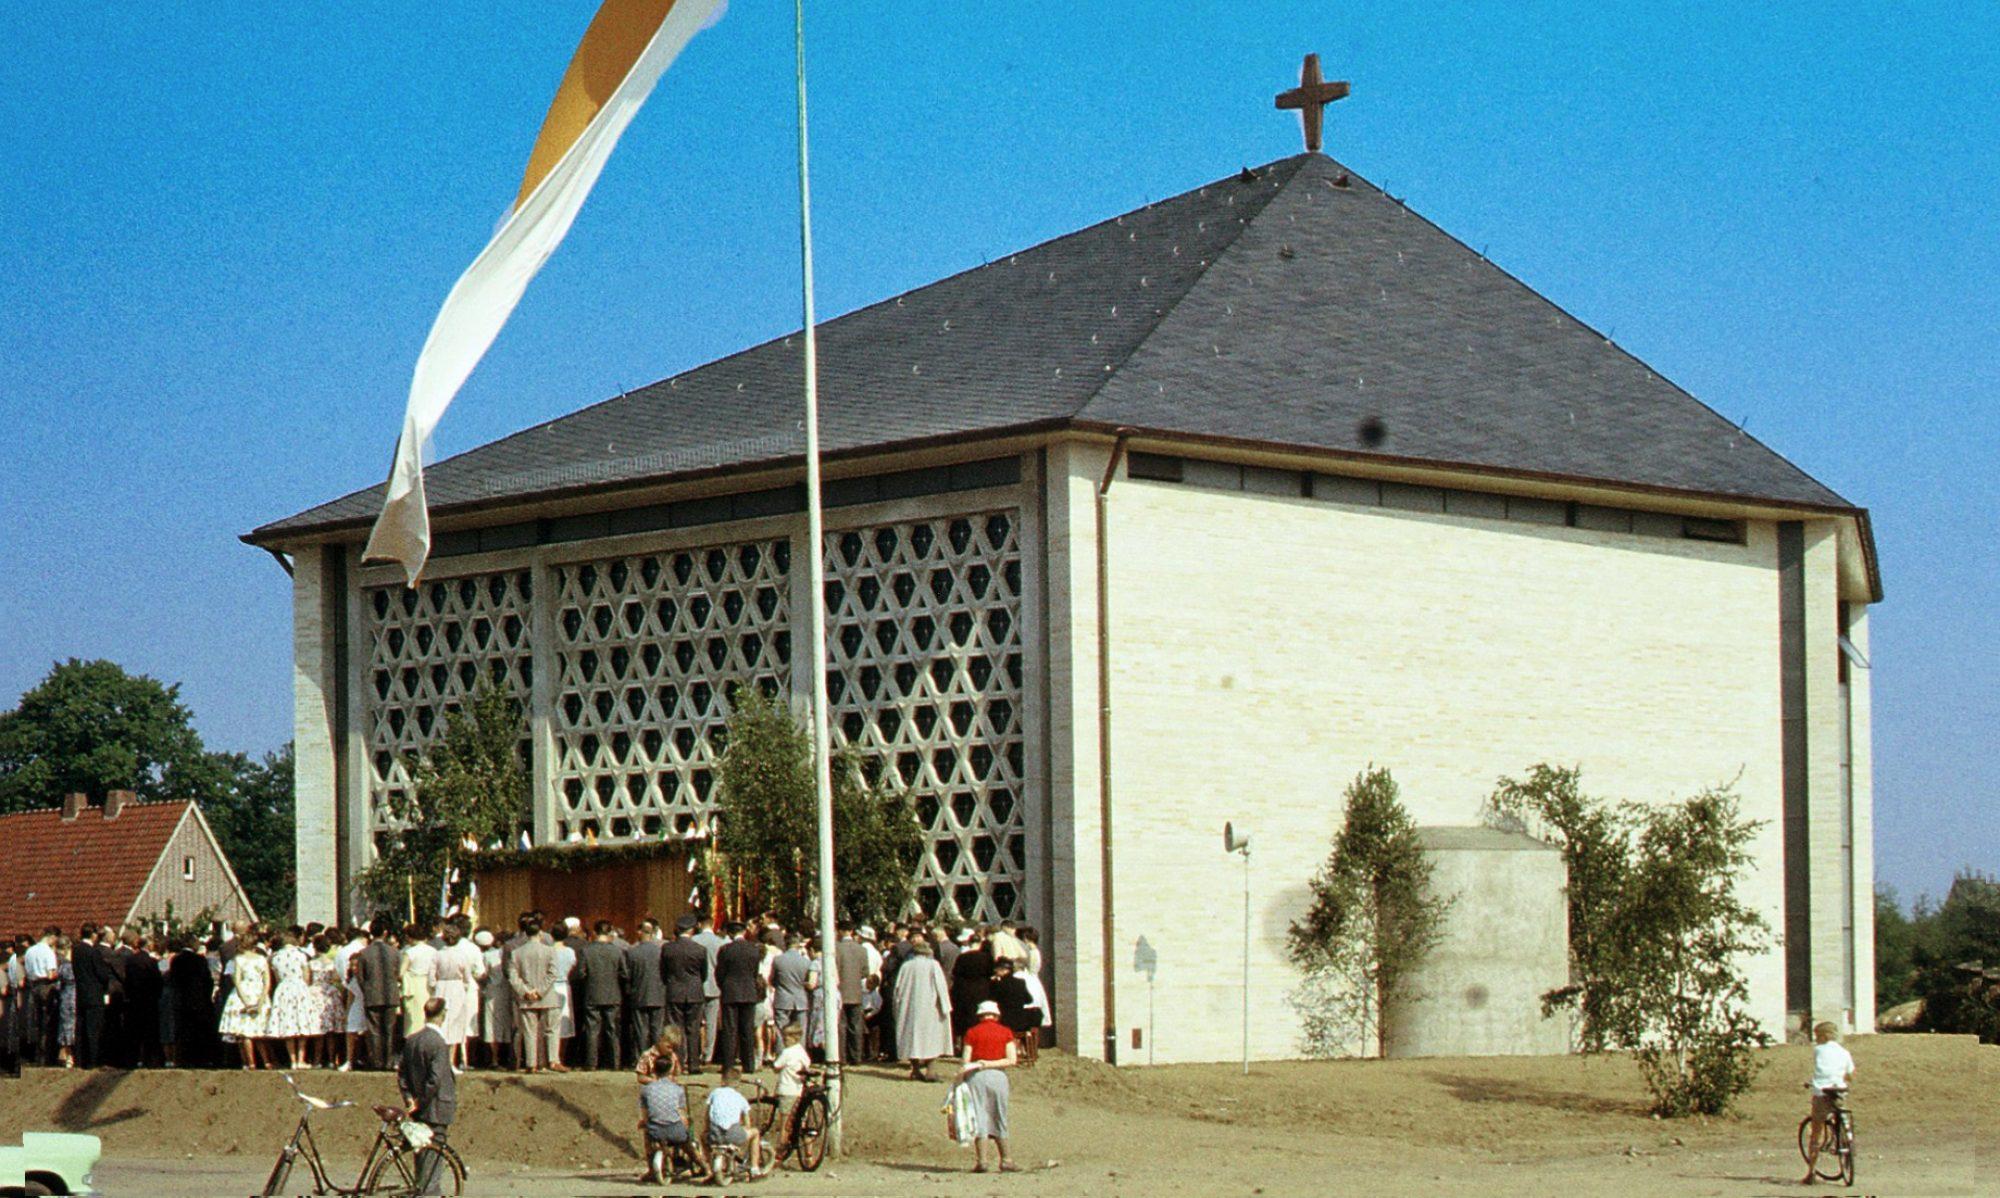 Heilig Geist Stade